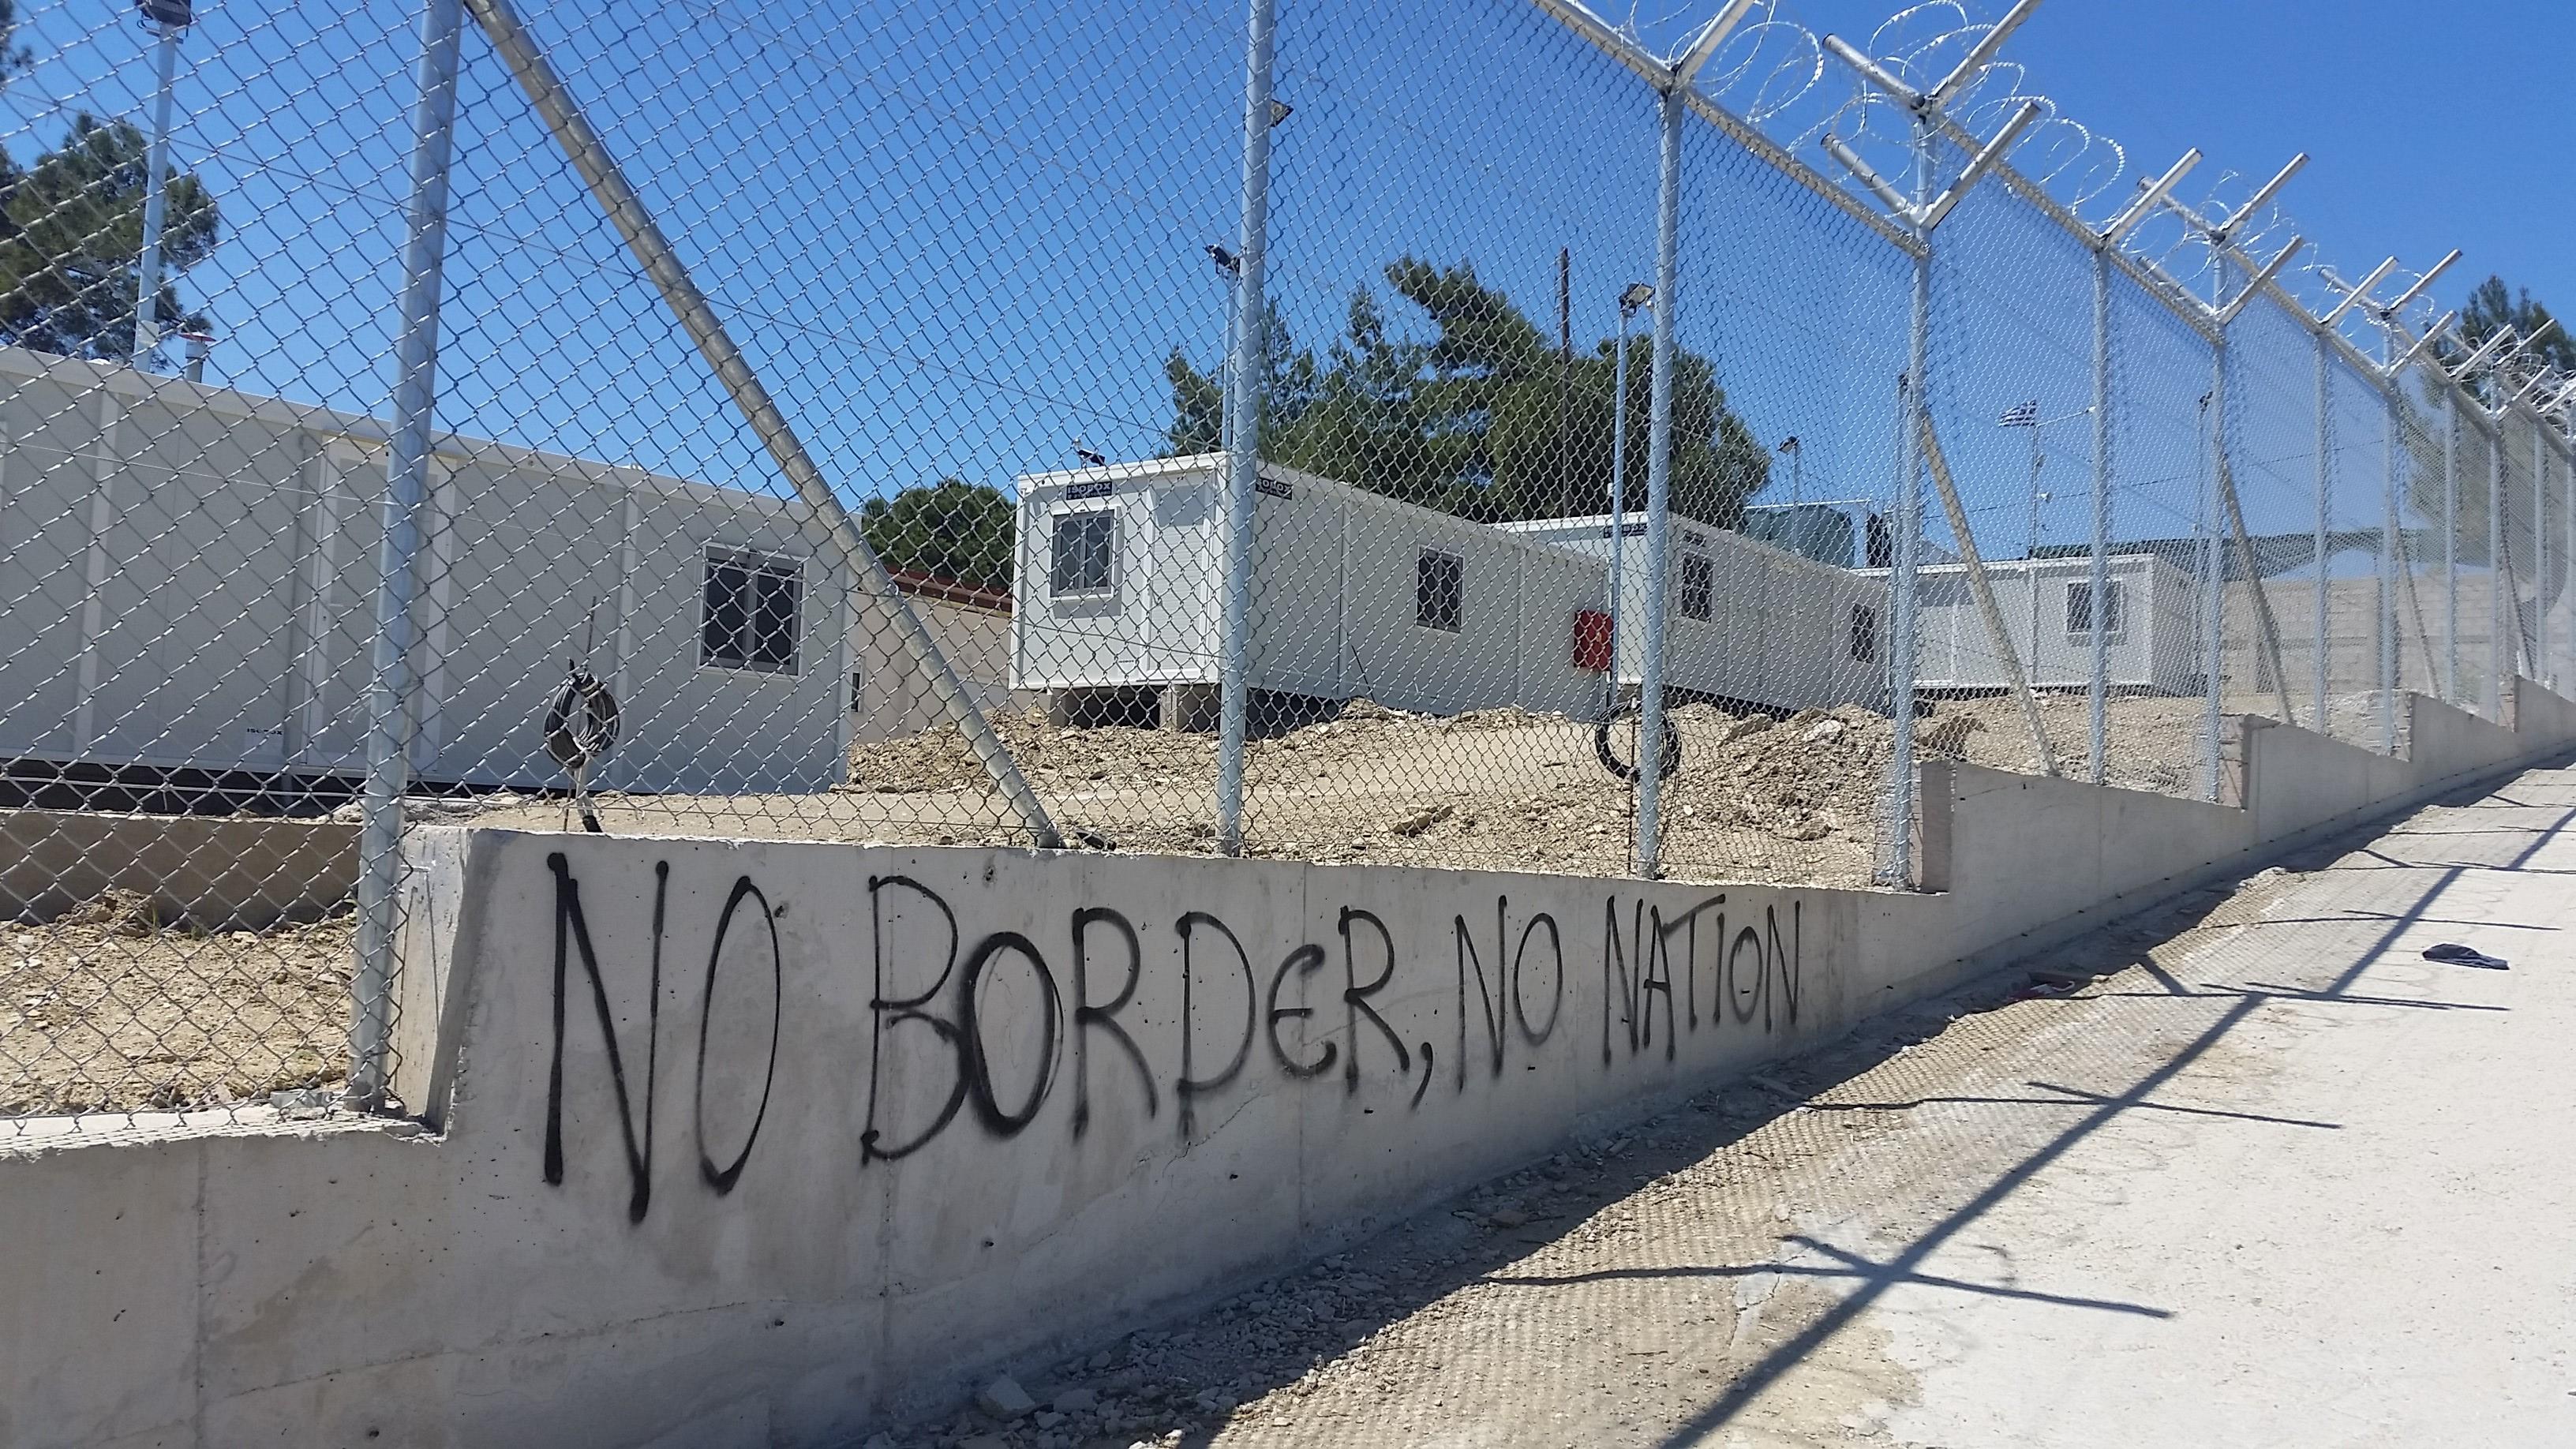 """No Border No Nation"" - Parole auf dem Lager Moria auf Lesbos"